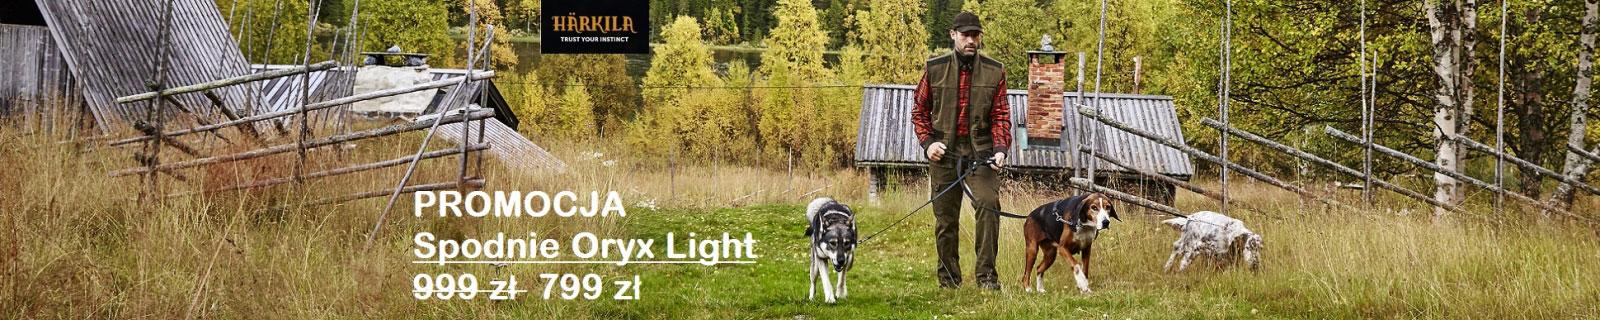 Oryx light